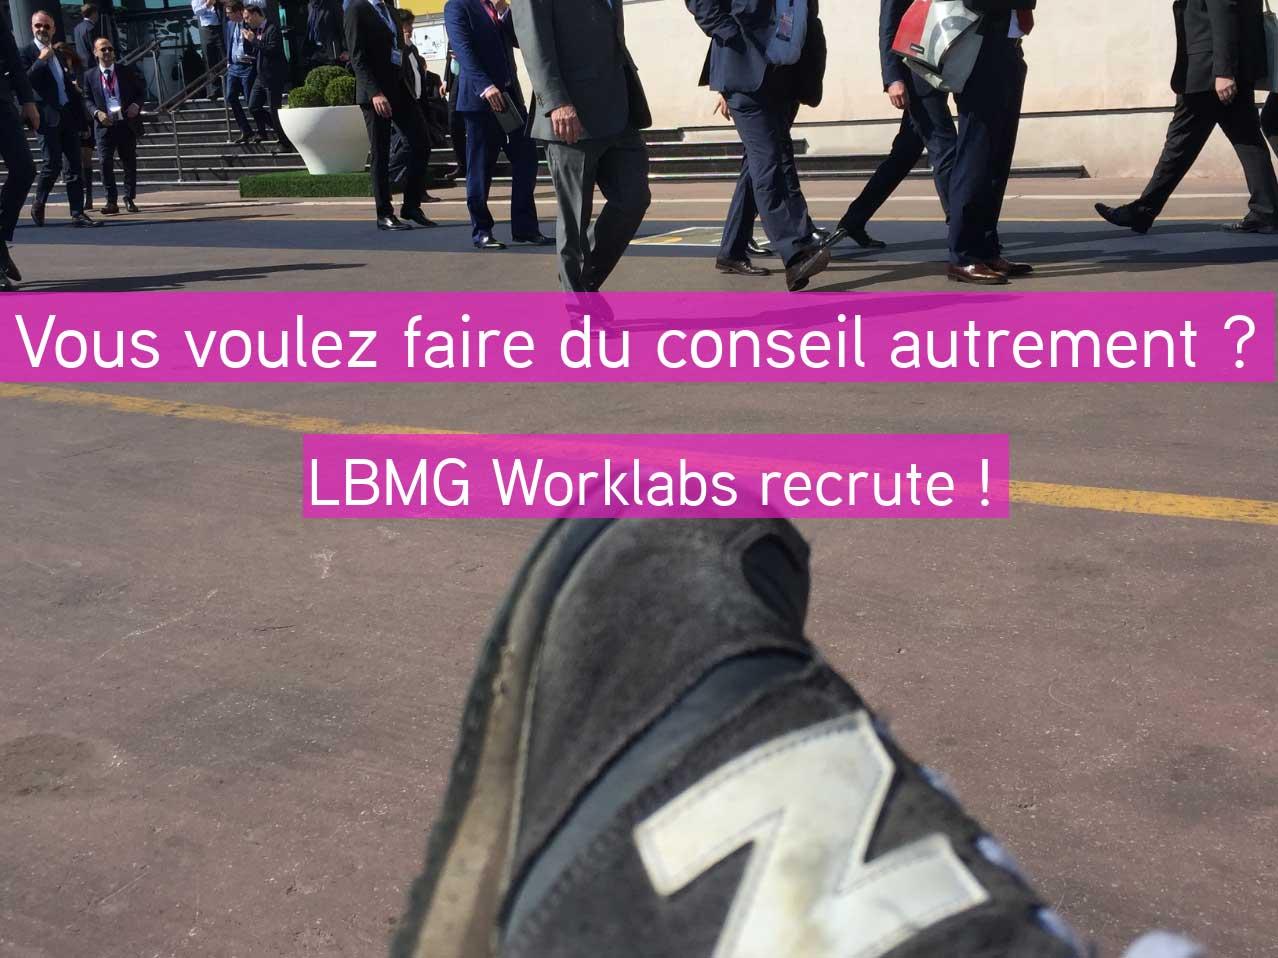 LBMG Worklabs recrute un consultant